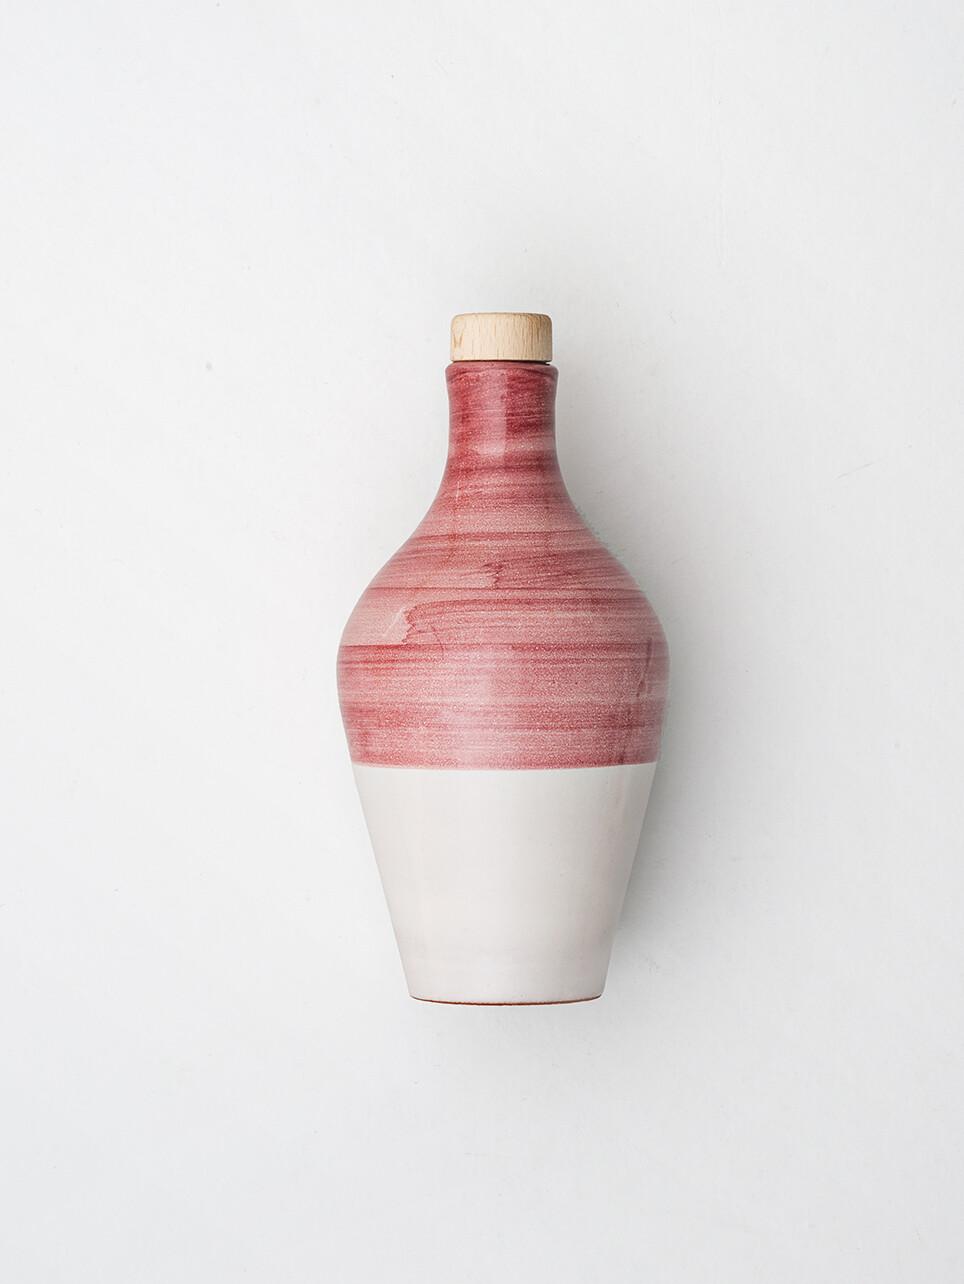 La Fiaschetta Extra Natives Olivenöl,  470ml Keramikkrug in Rot